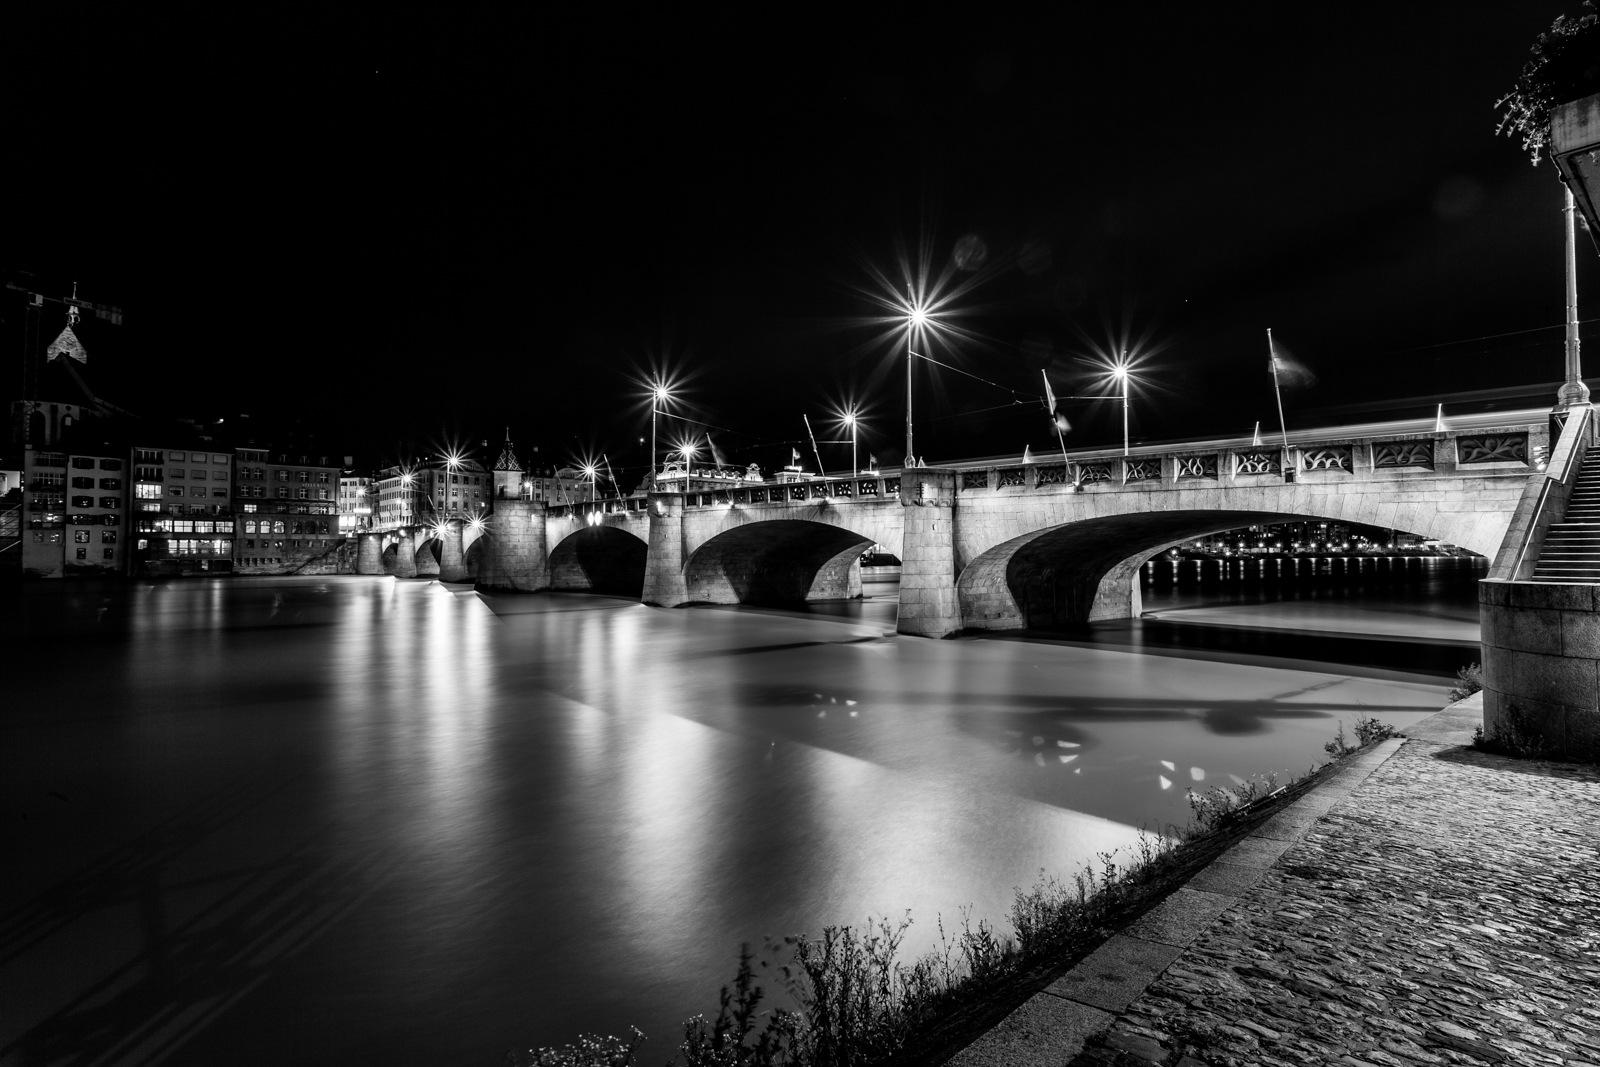 One nigth in Basel by fotomark